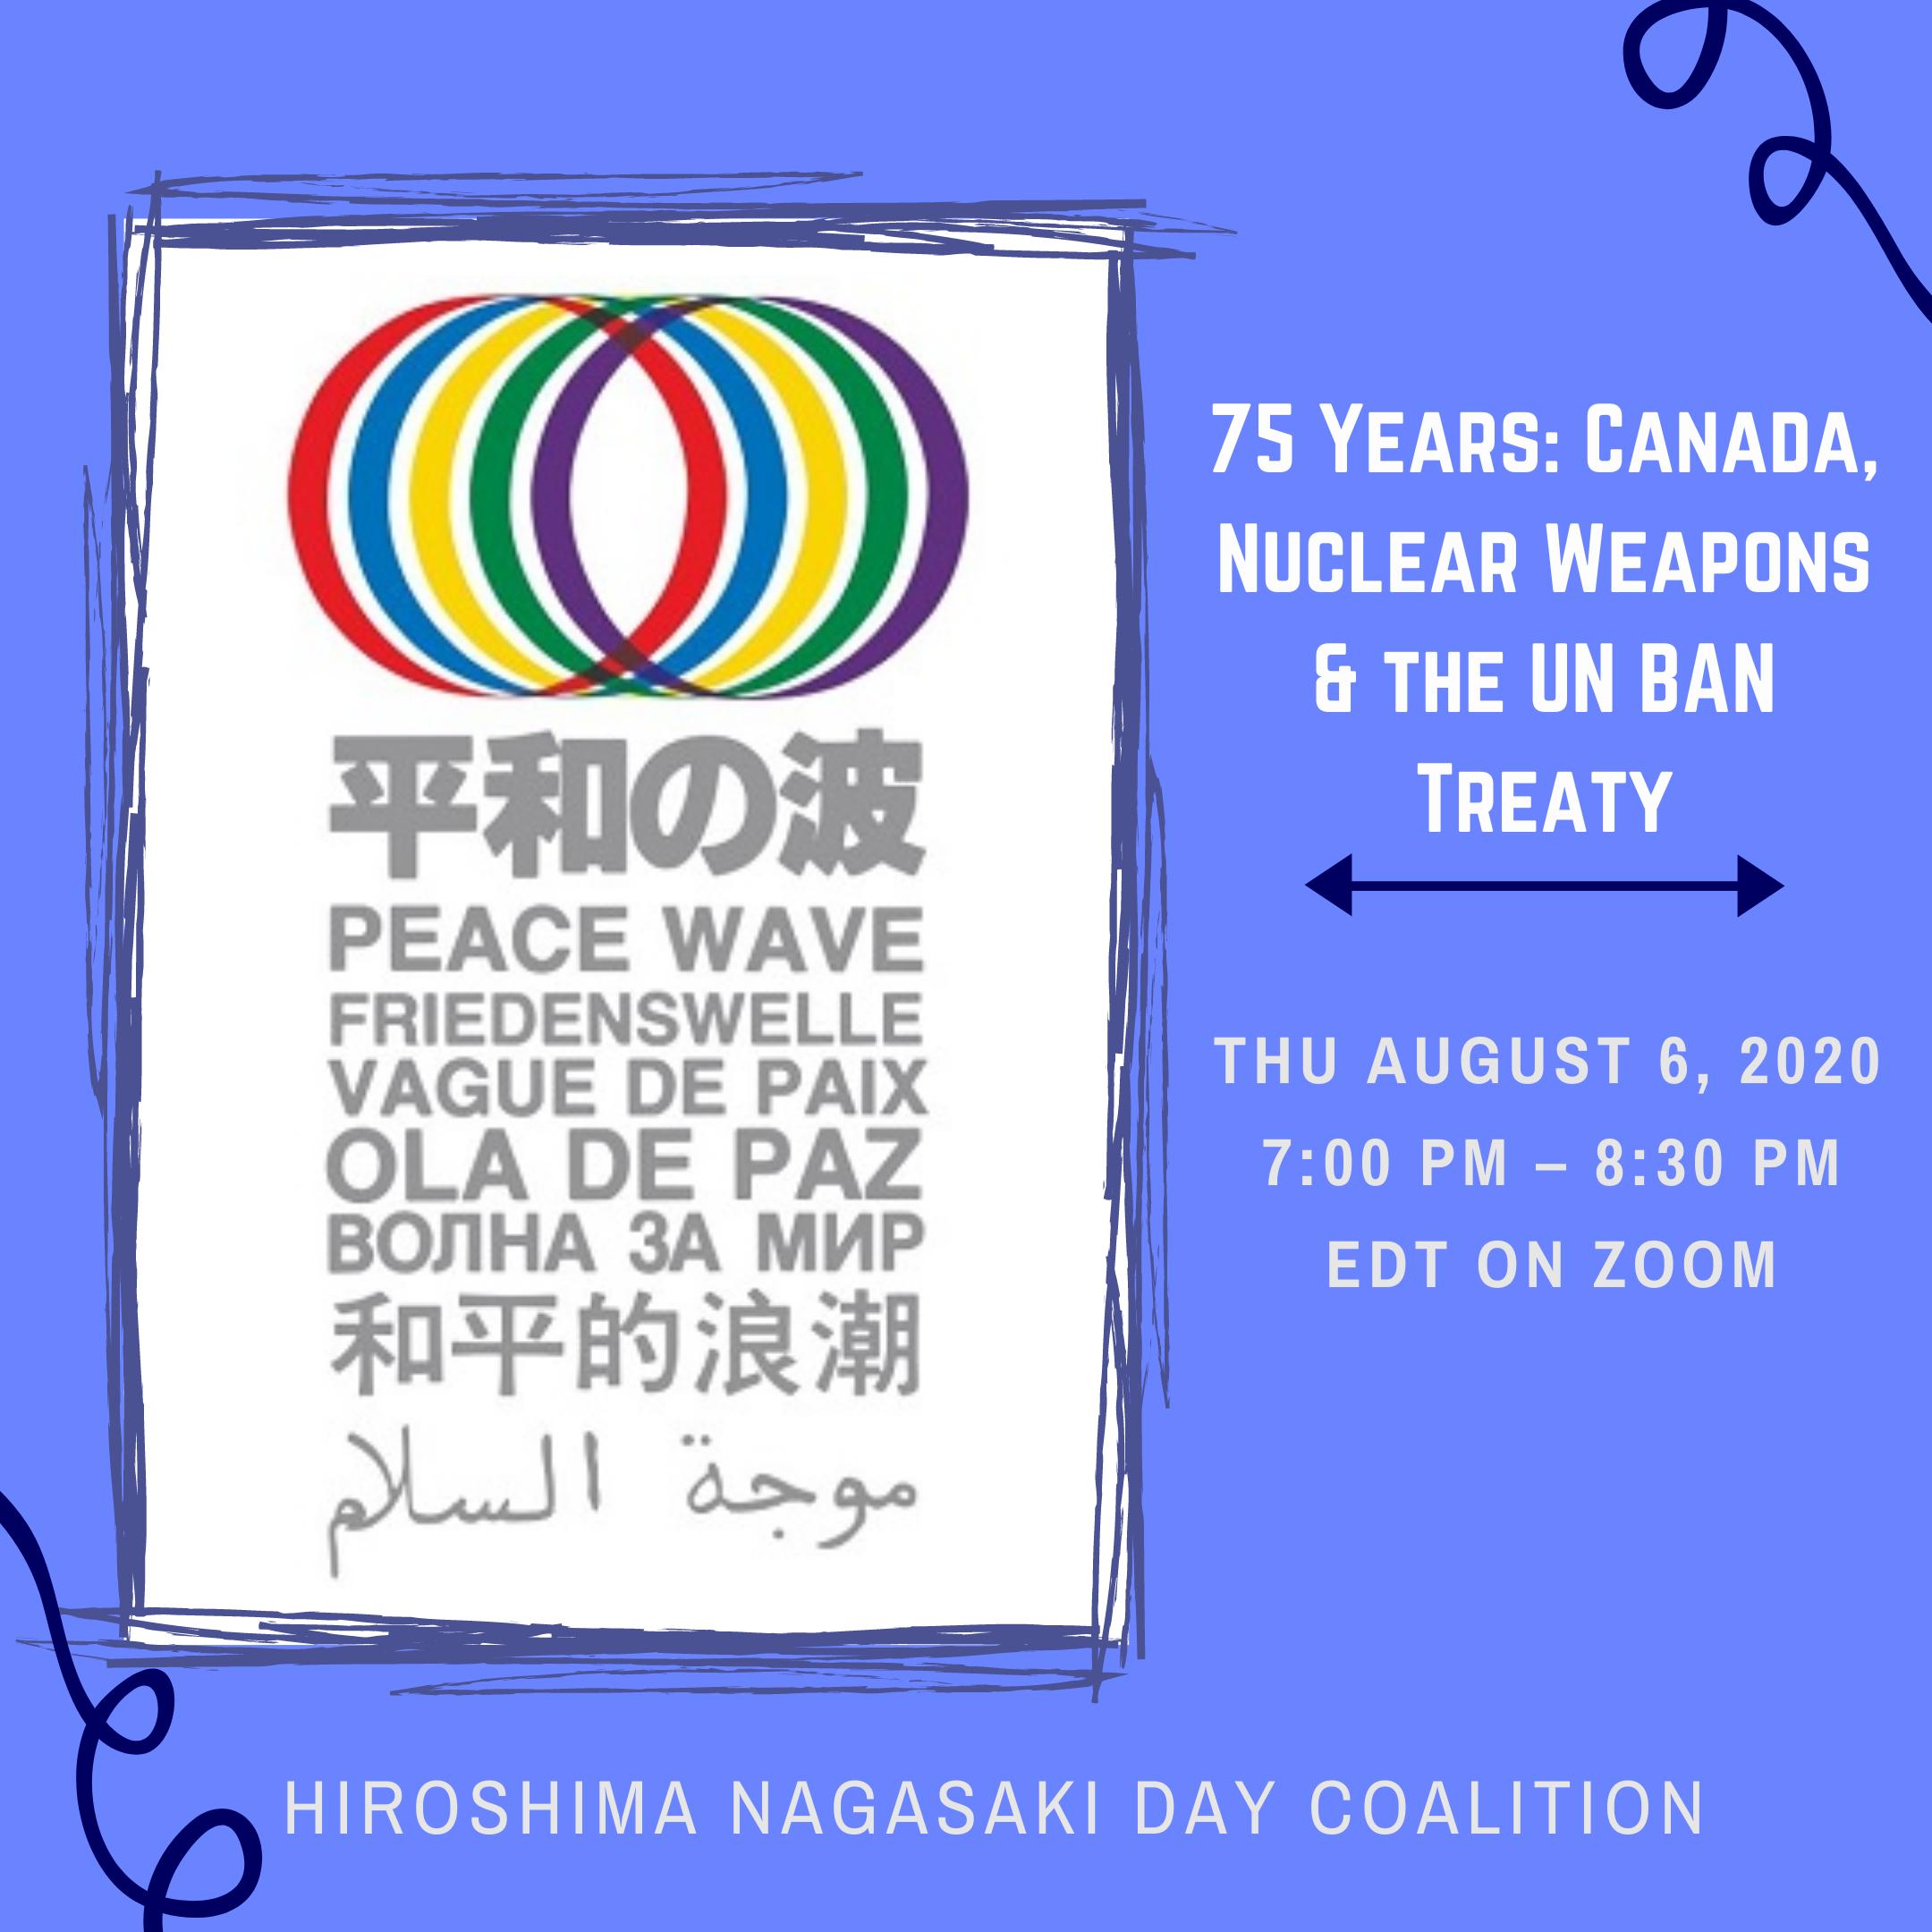 Toronto's Hiroshima/ Nagasaki Day Coalition